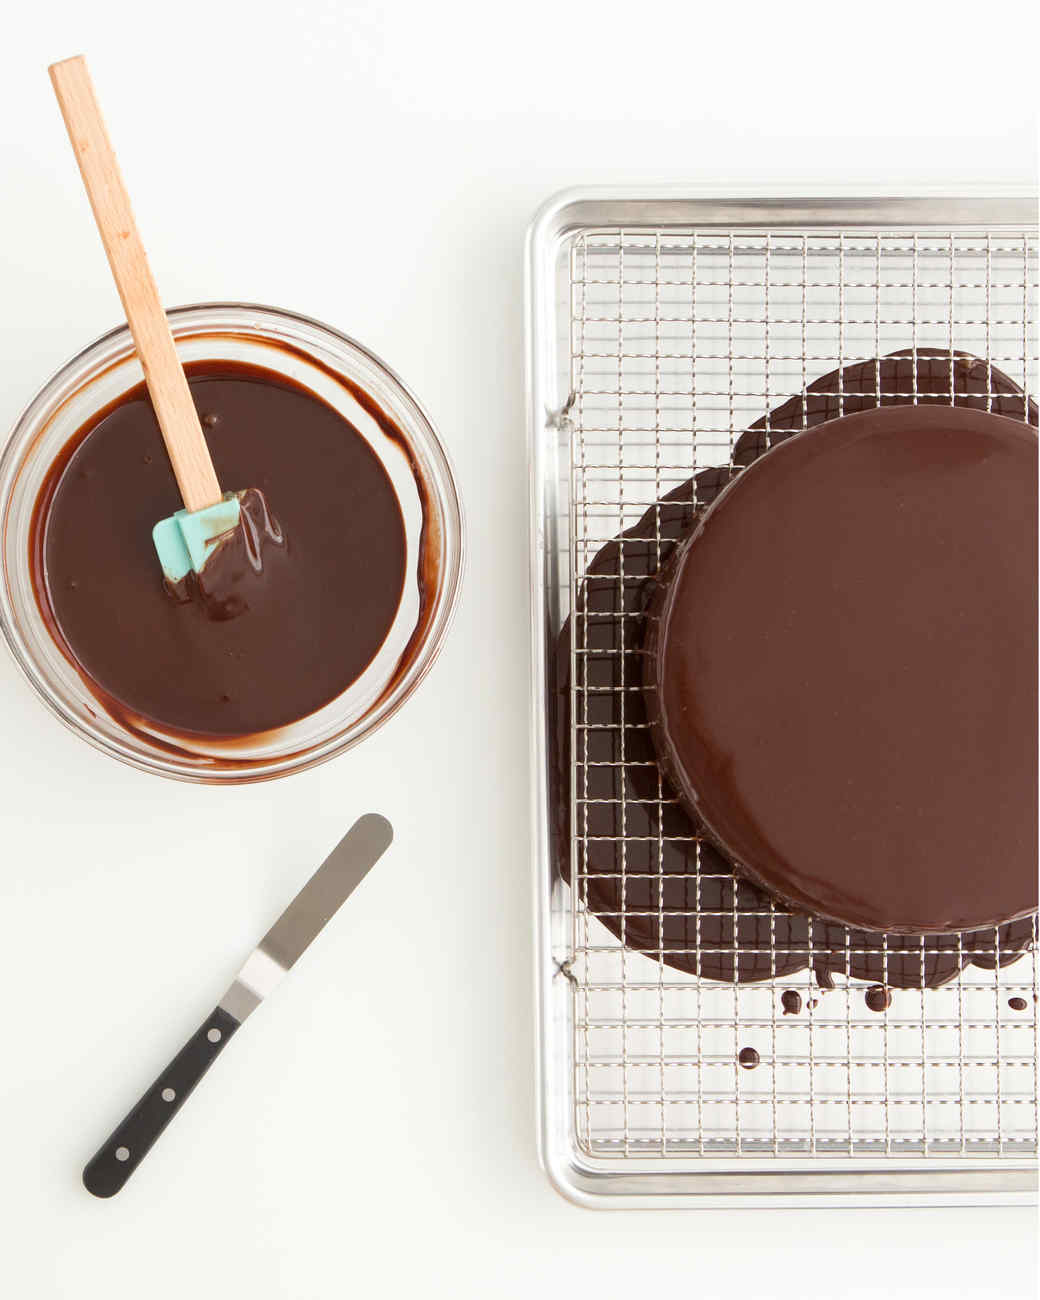 glaze-cake-htb132.jpg